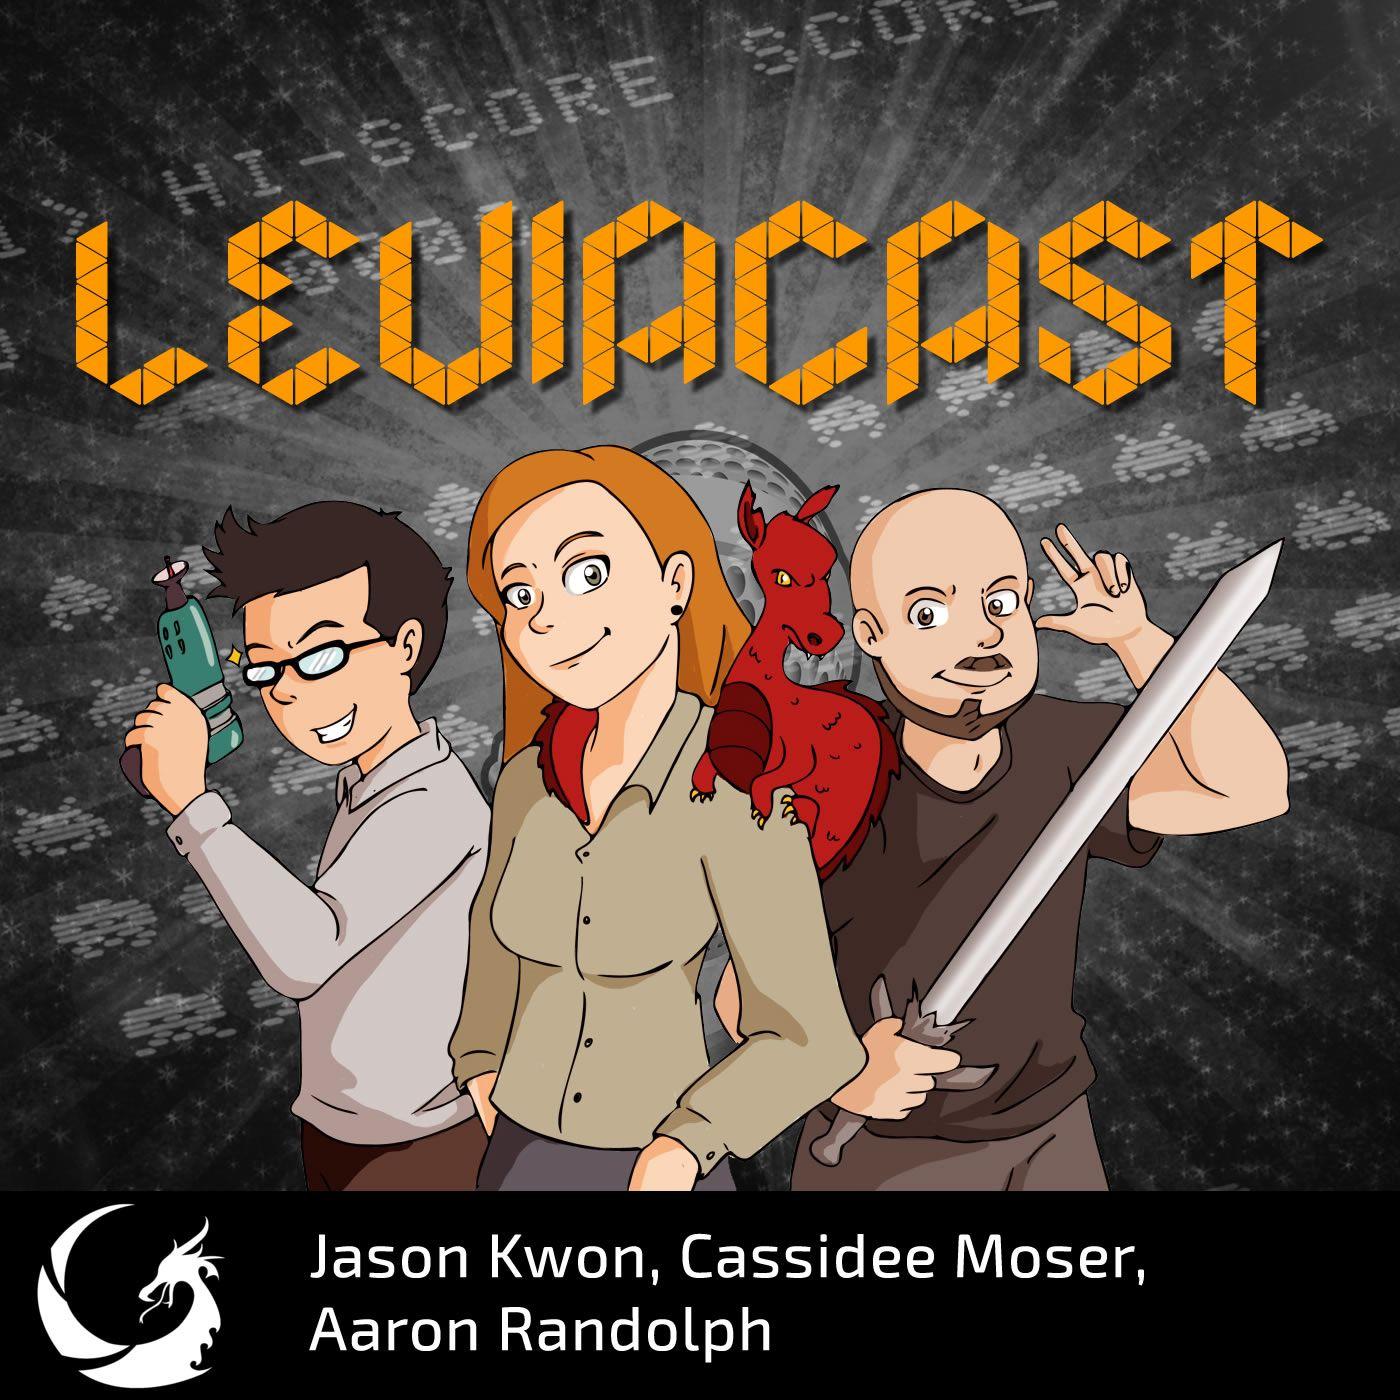 Leviacast 57 Escape Goat 2, Oculus Rift, and Game_Jam